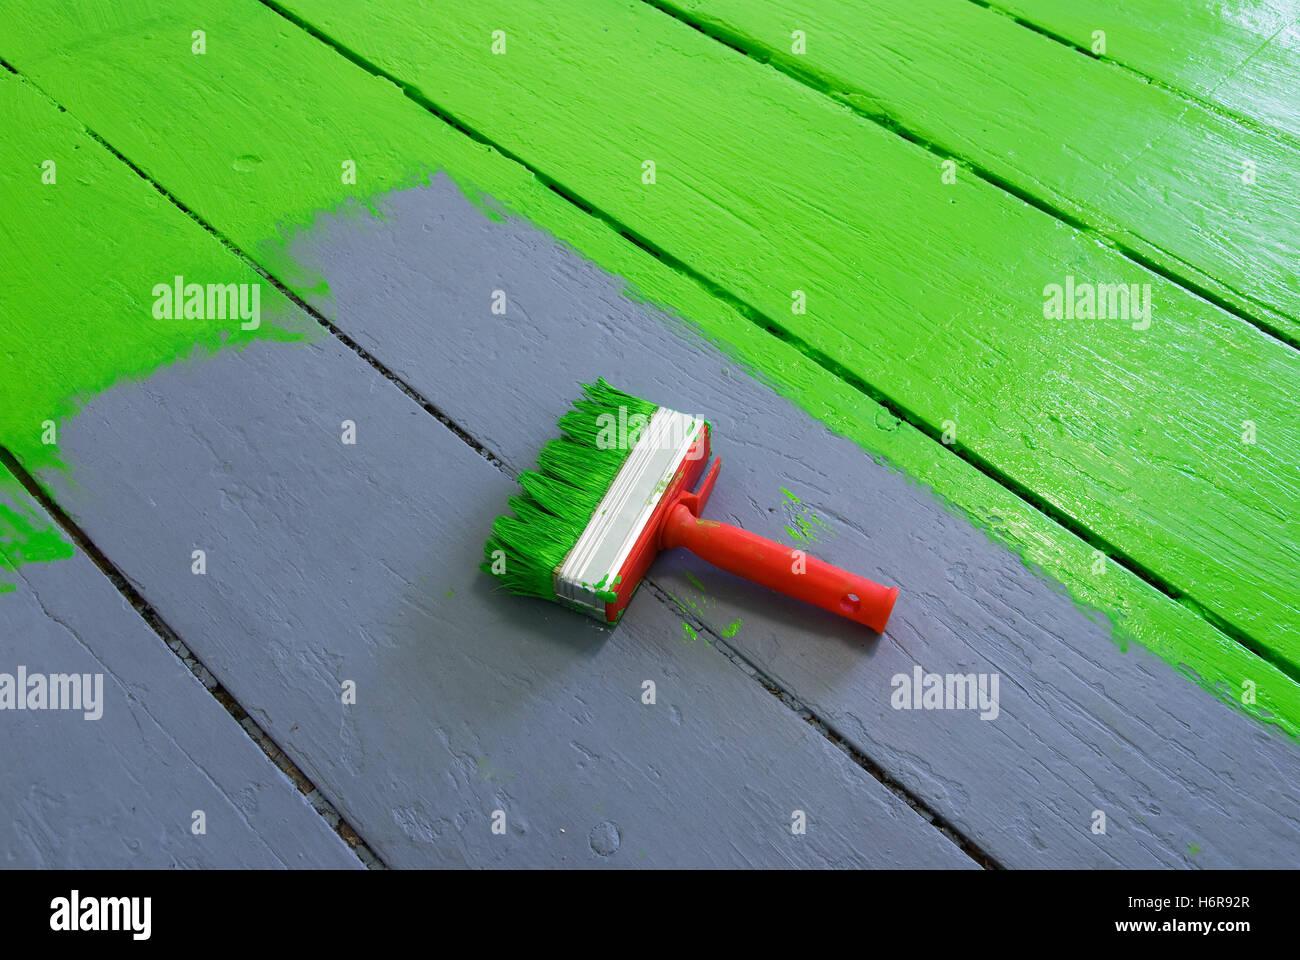 Den Boden Malen Stockfoto Bild 124672543 Alamy